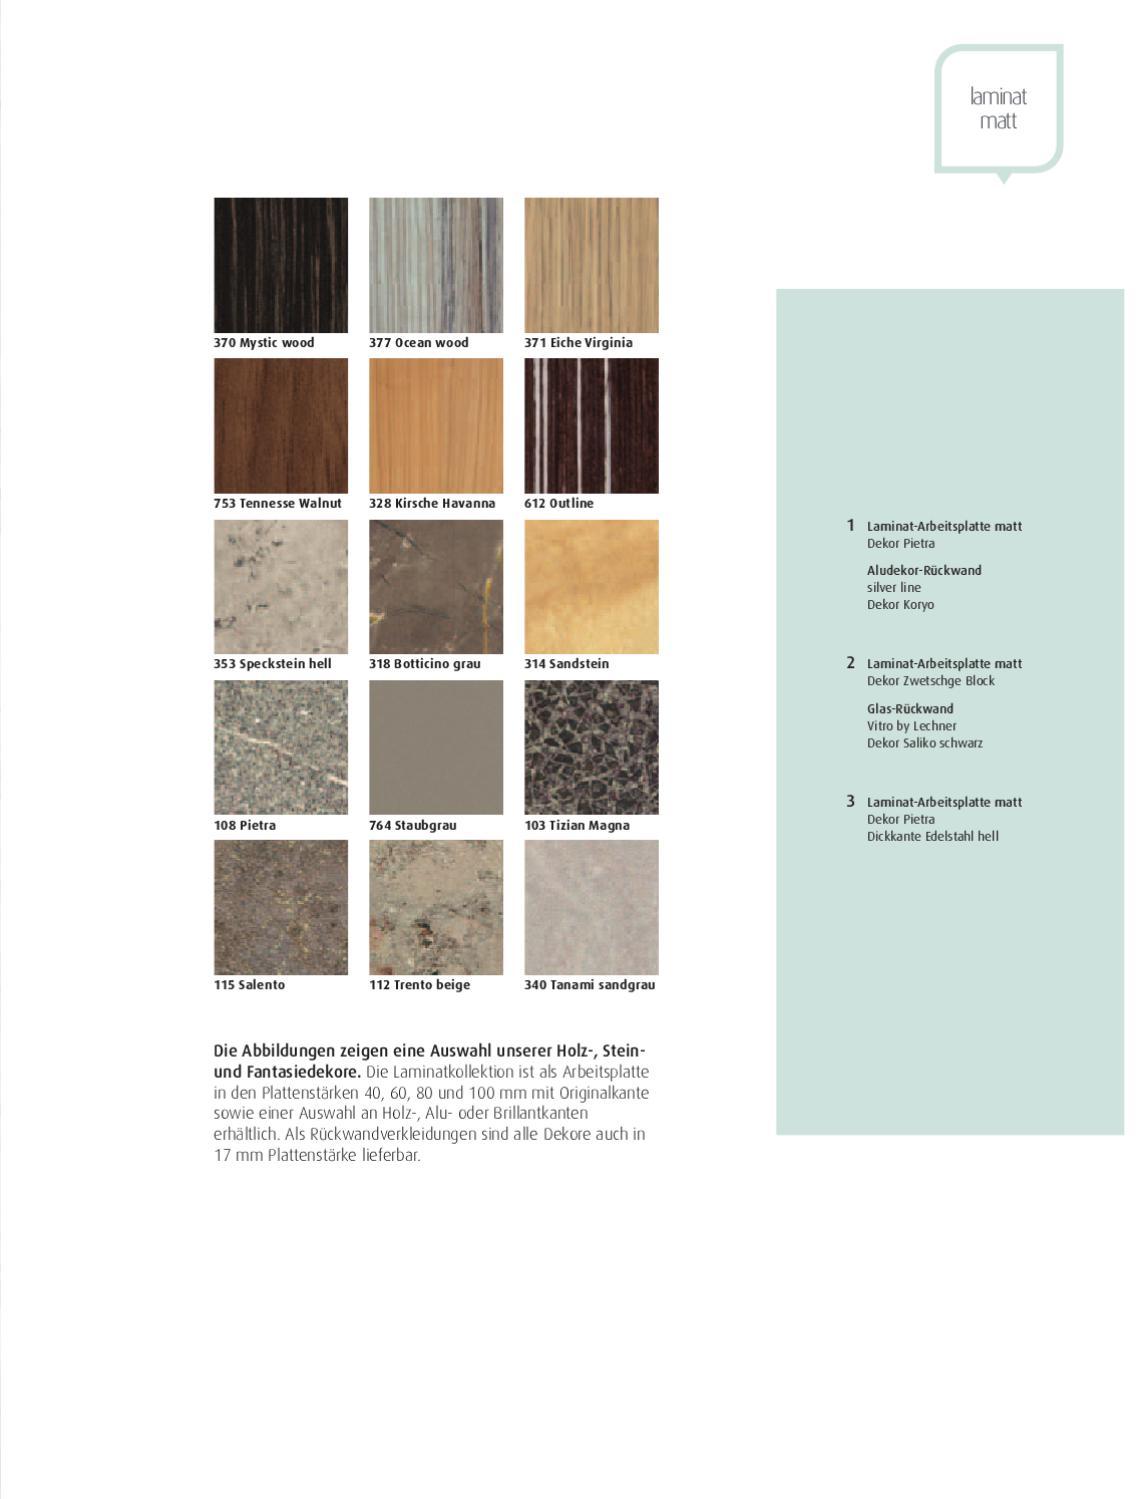 lechner publication by warrior company s r o issuu. Black Bedroom Furniture Sets. Home Design Ideas